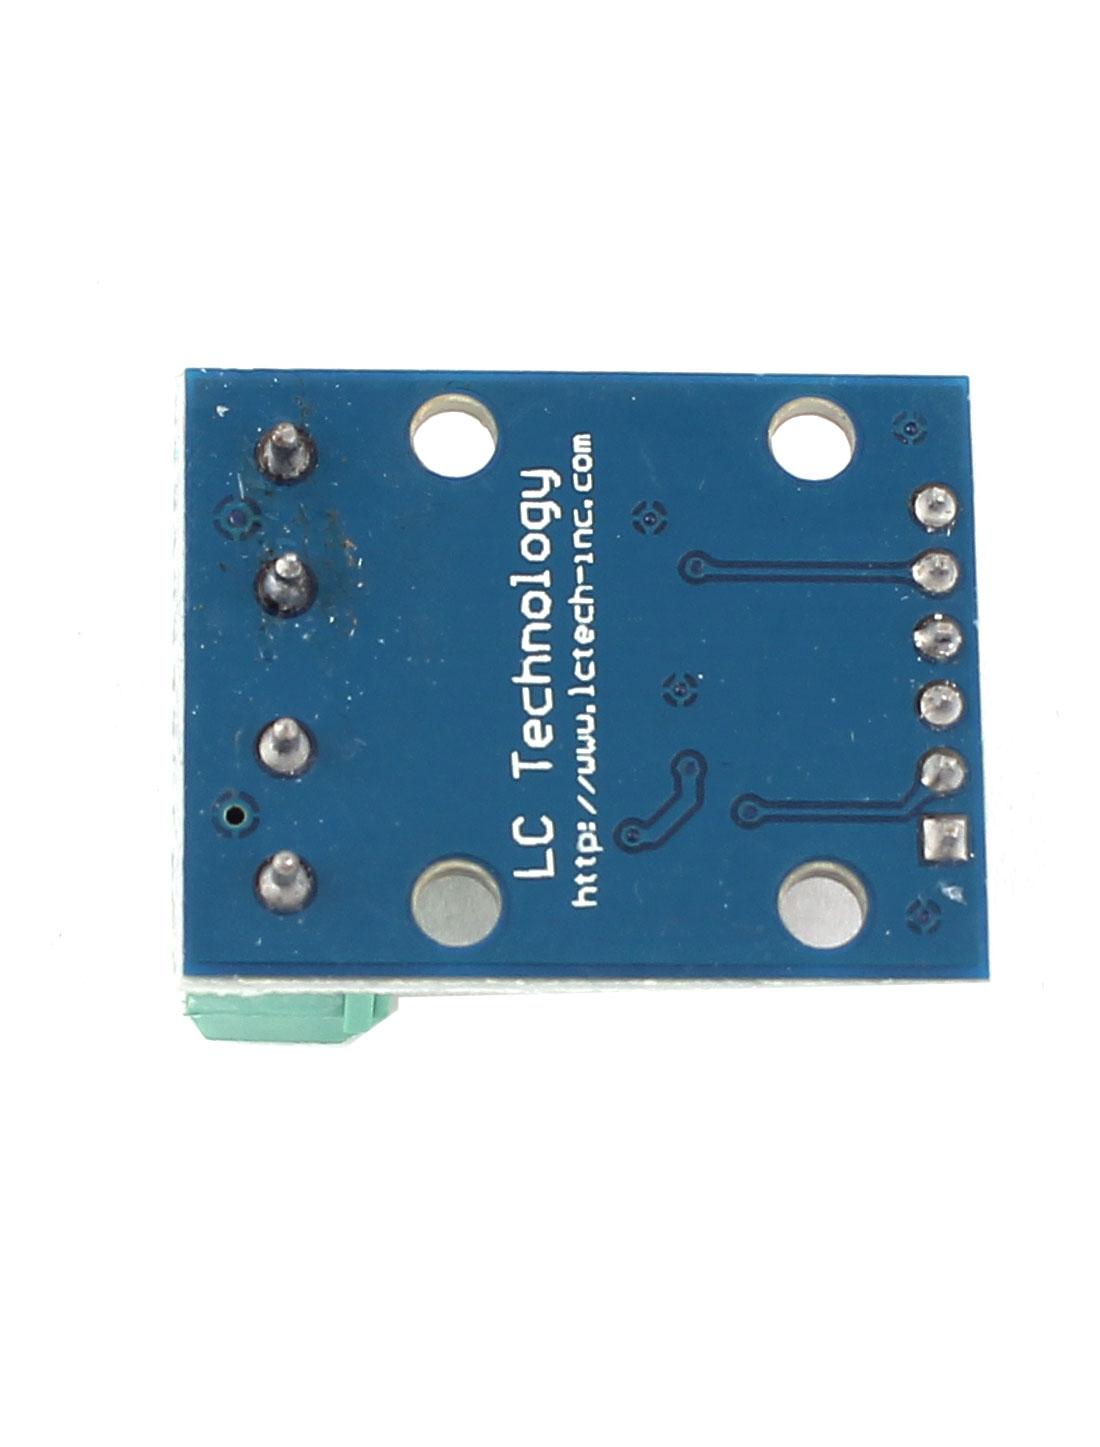 H Bridge Stepper Motor Dual Dc Motor Driver Controller